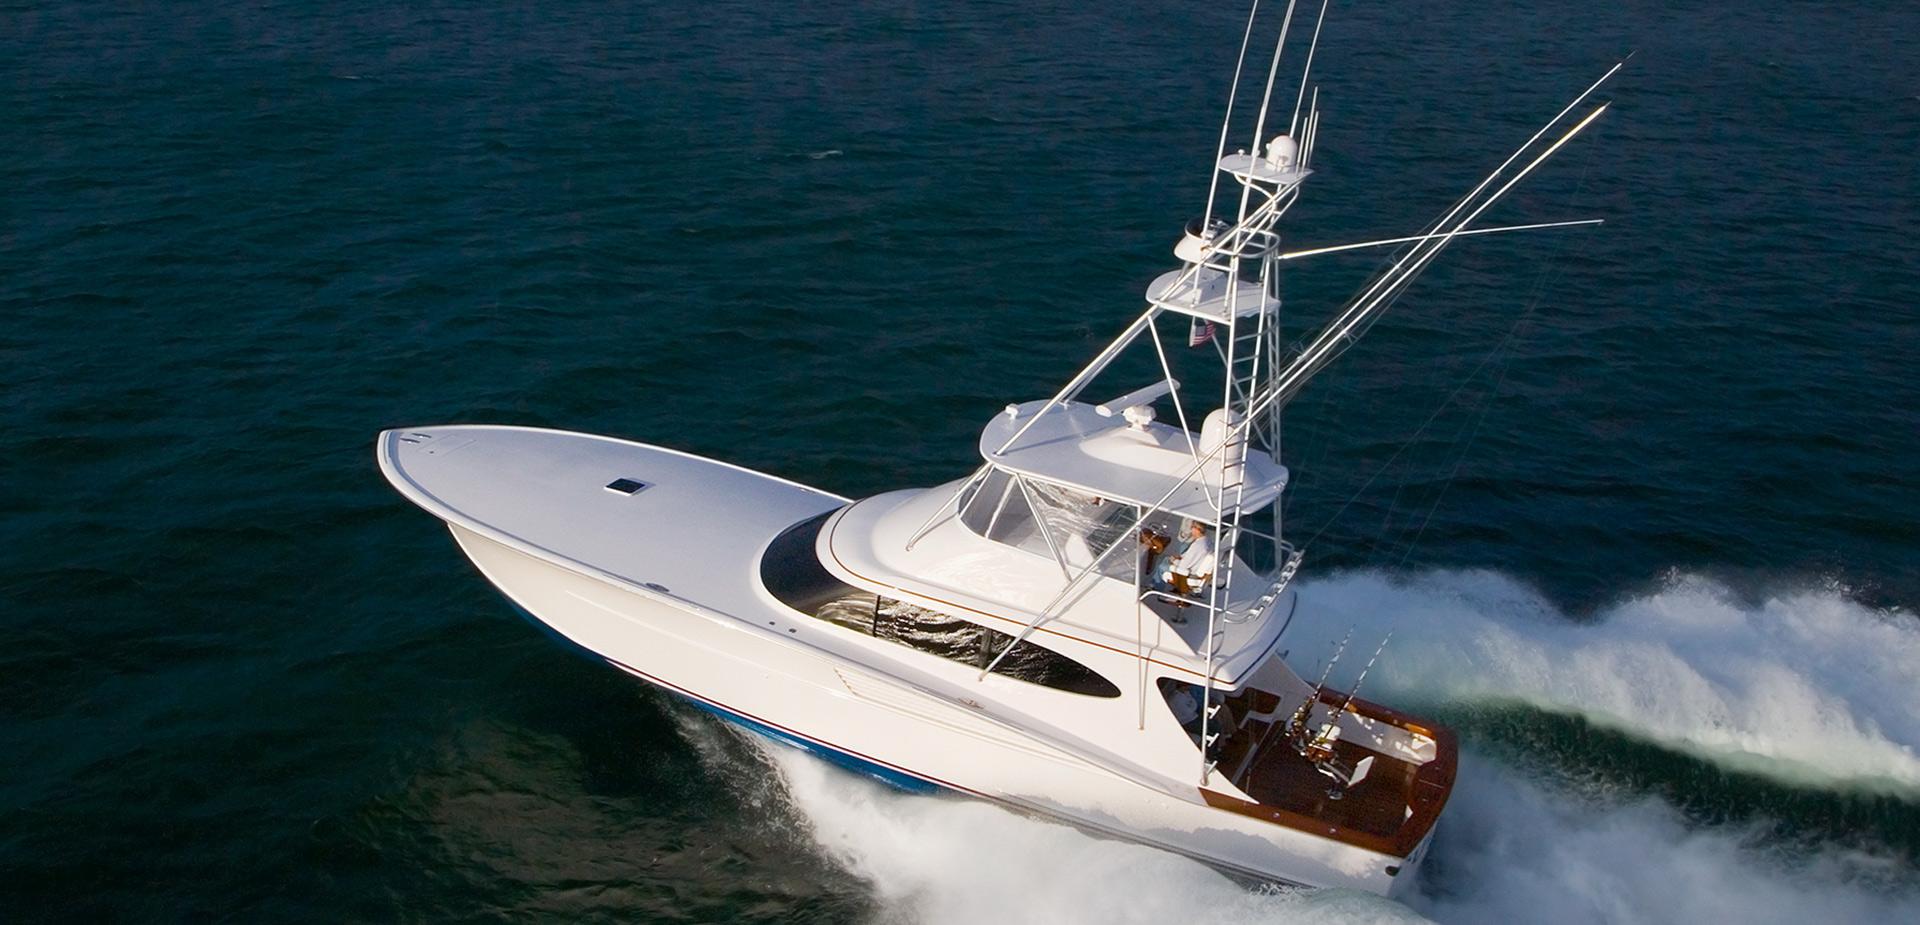 Bayliss 64 Hey Chama Custom Sport Fishing Boat